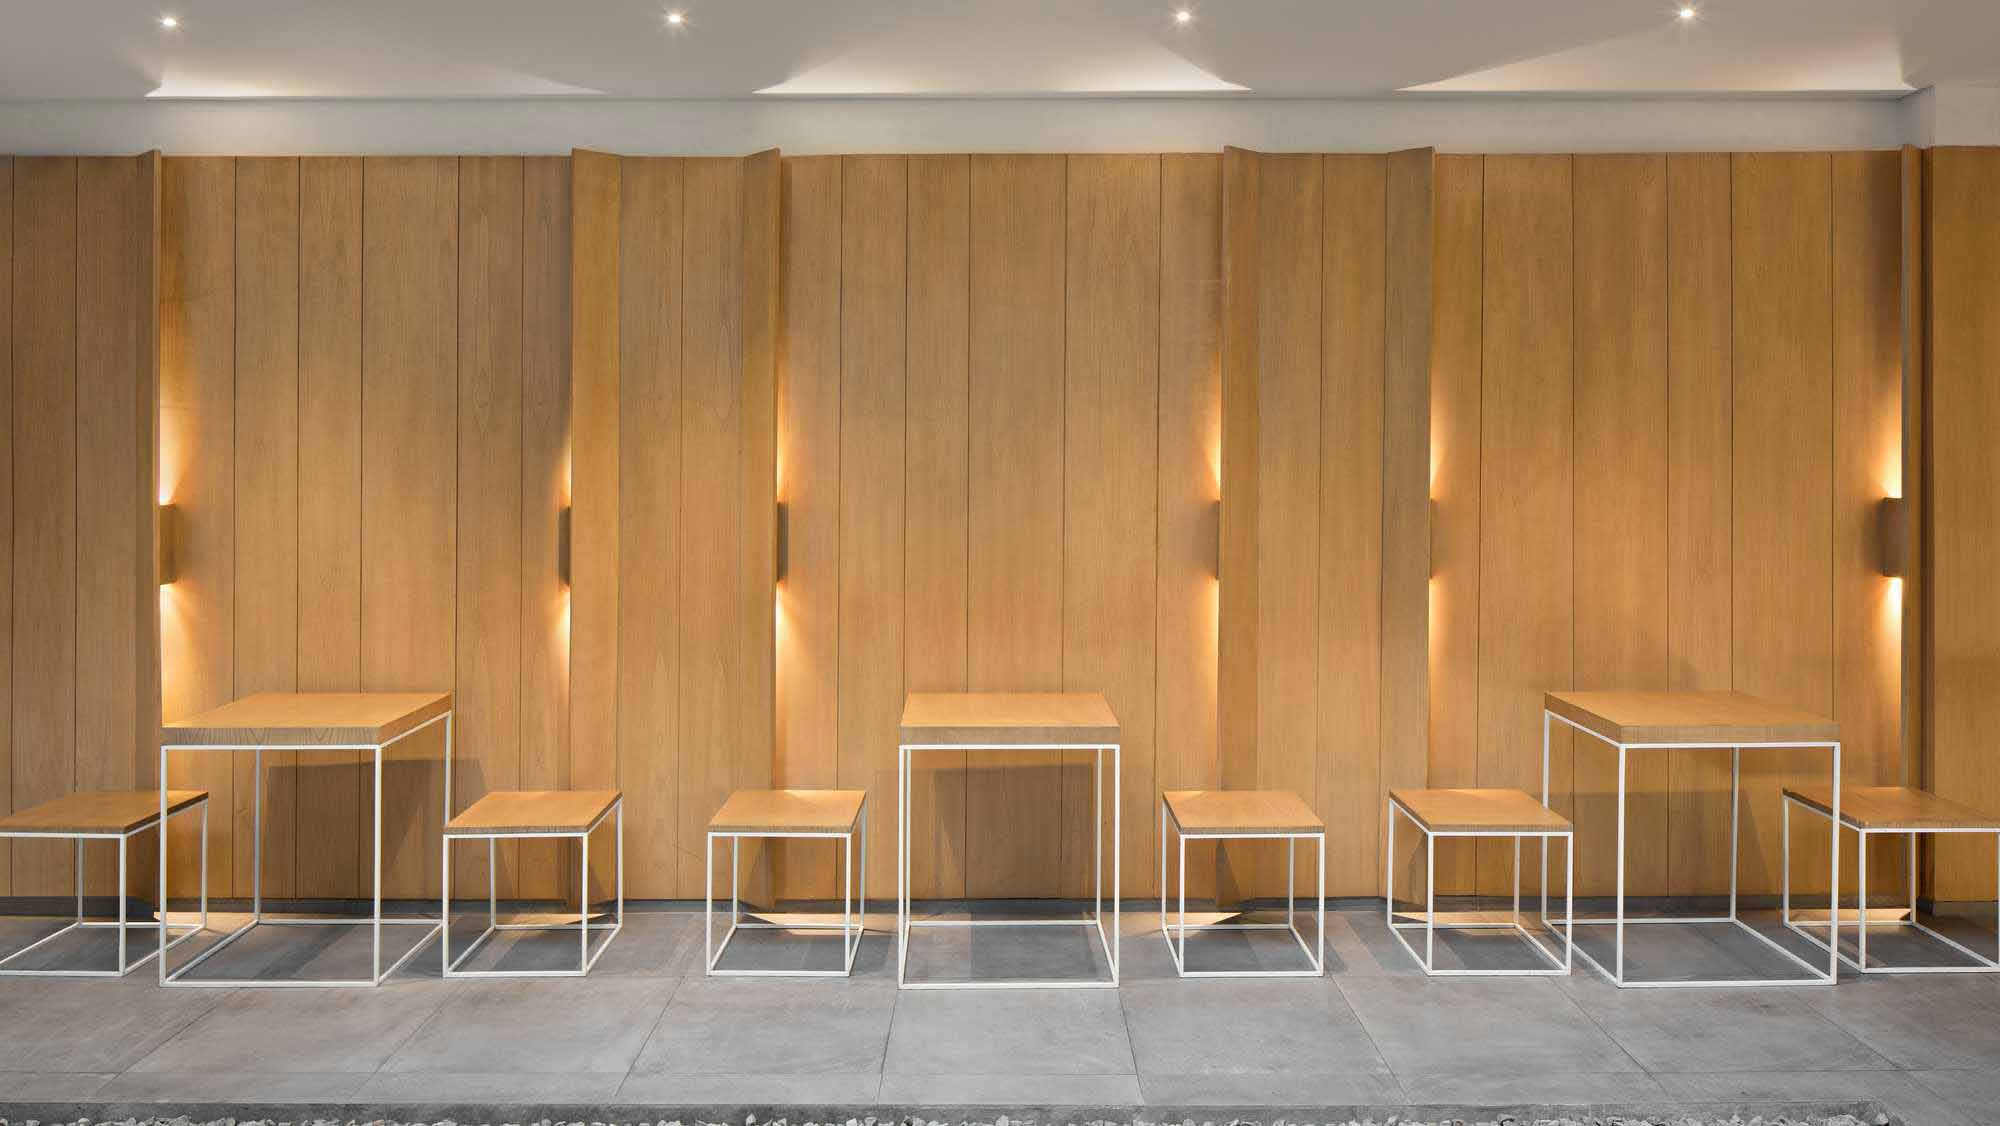 Teknik pencahayaan yang apik, kafe karya PT. Adf, via arsitag.com